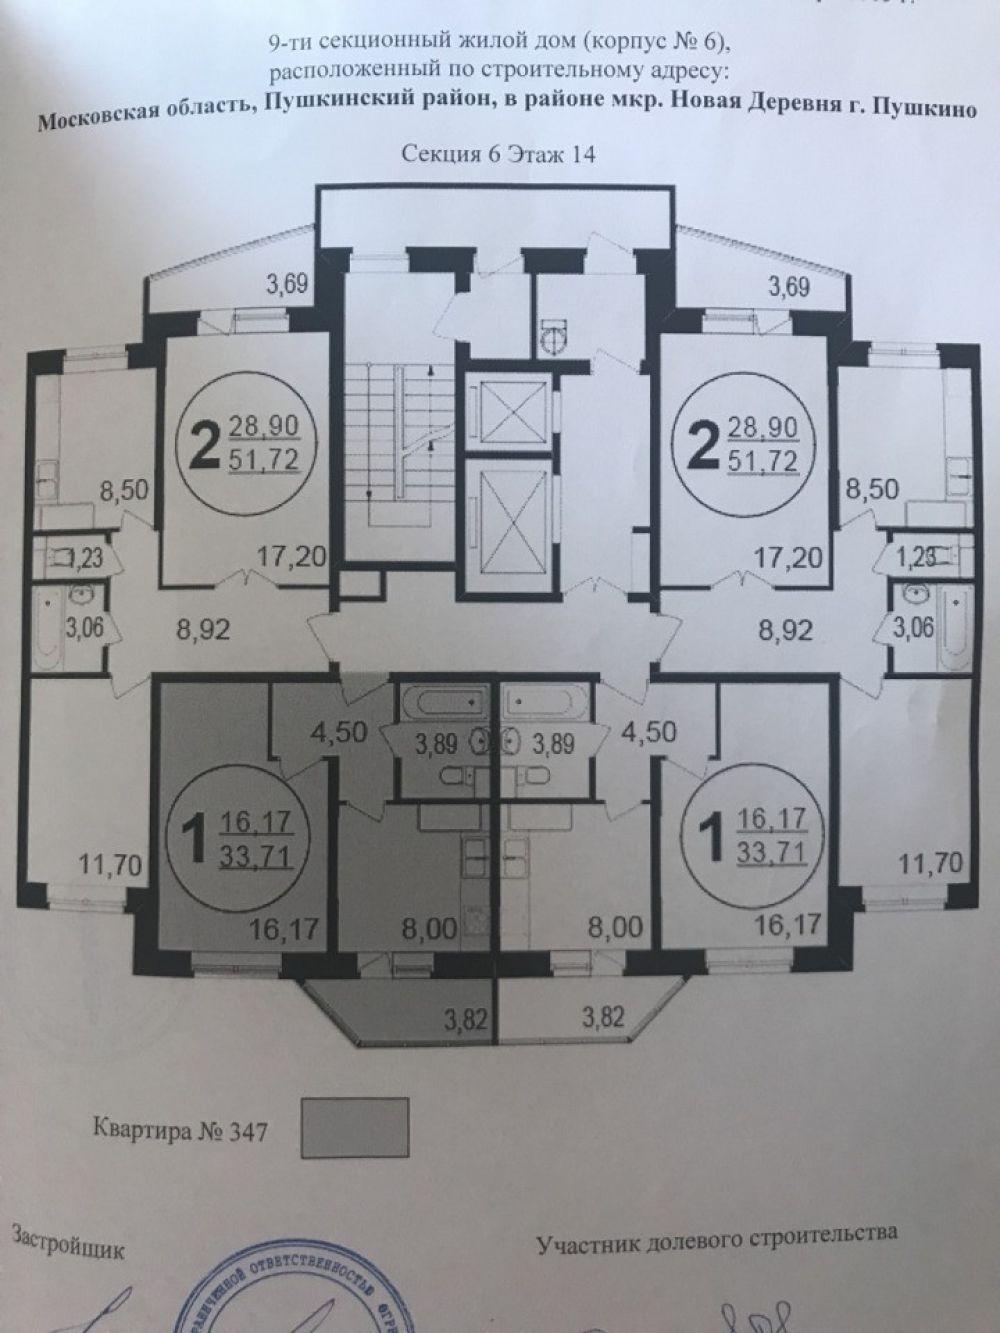 1-комнатная квартира г. Пушкино ЖК Новое Пушкино ул.Просвещения д.13 корп.3, фото 1